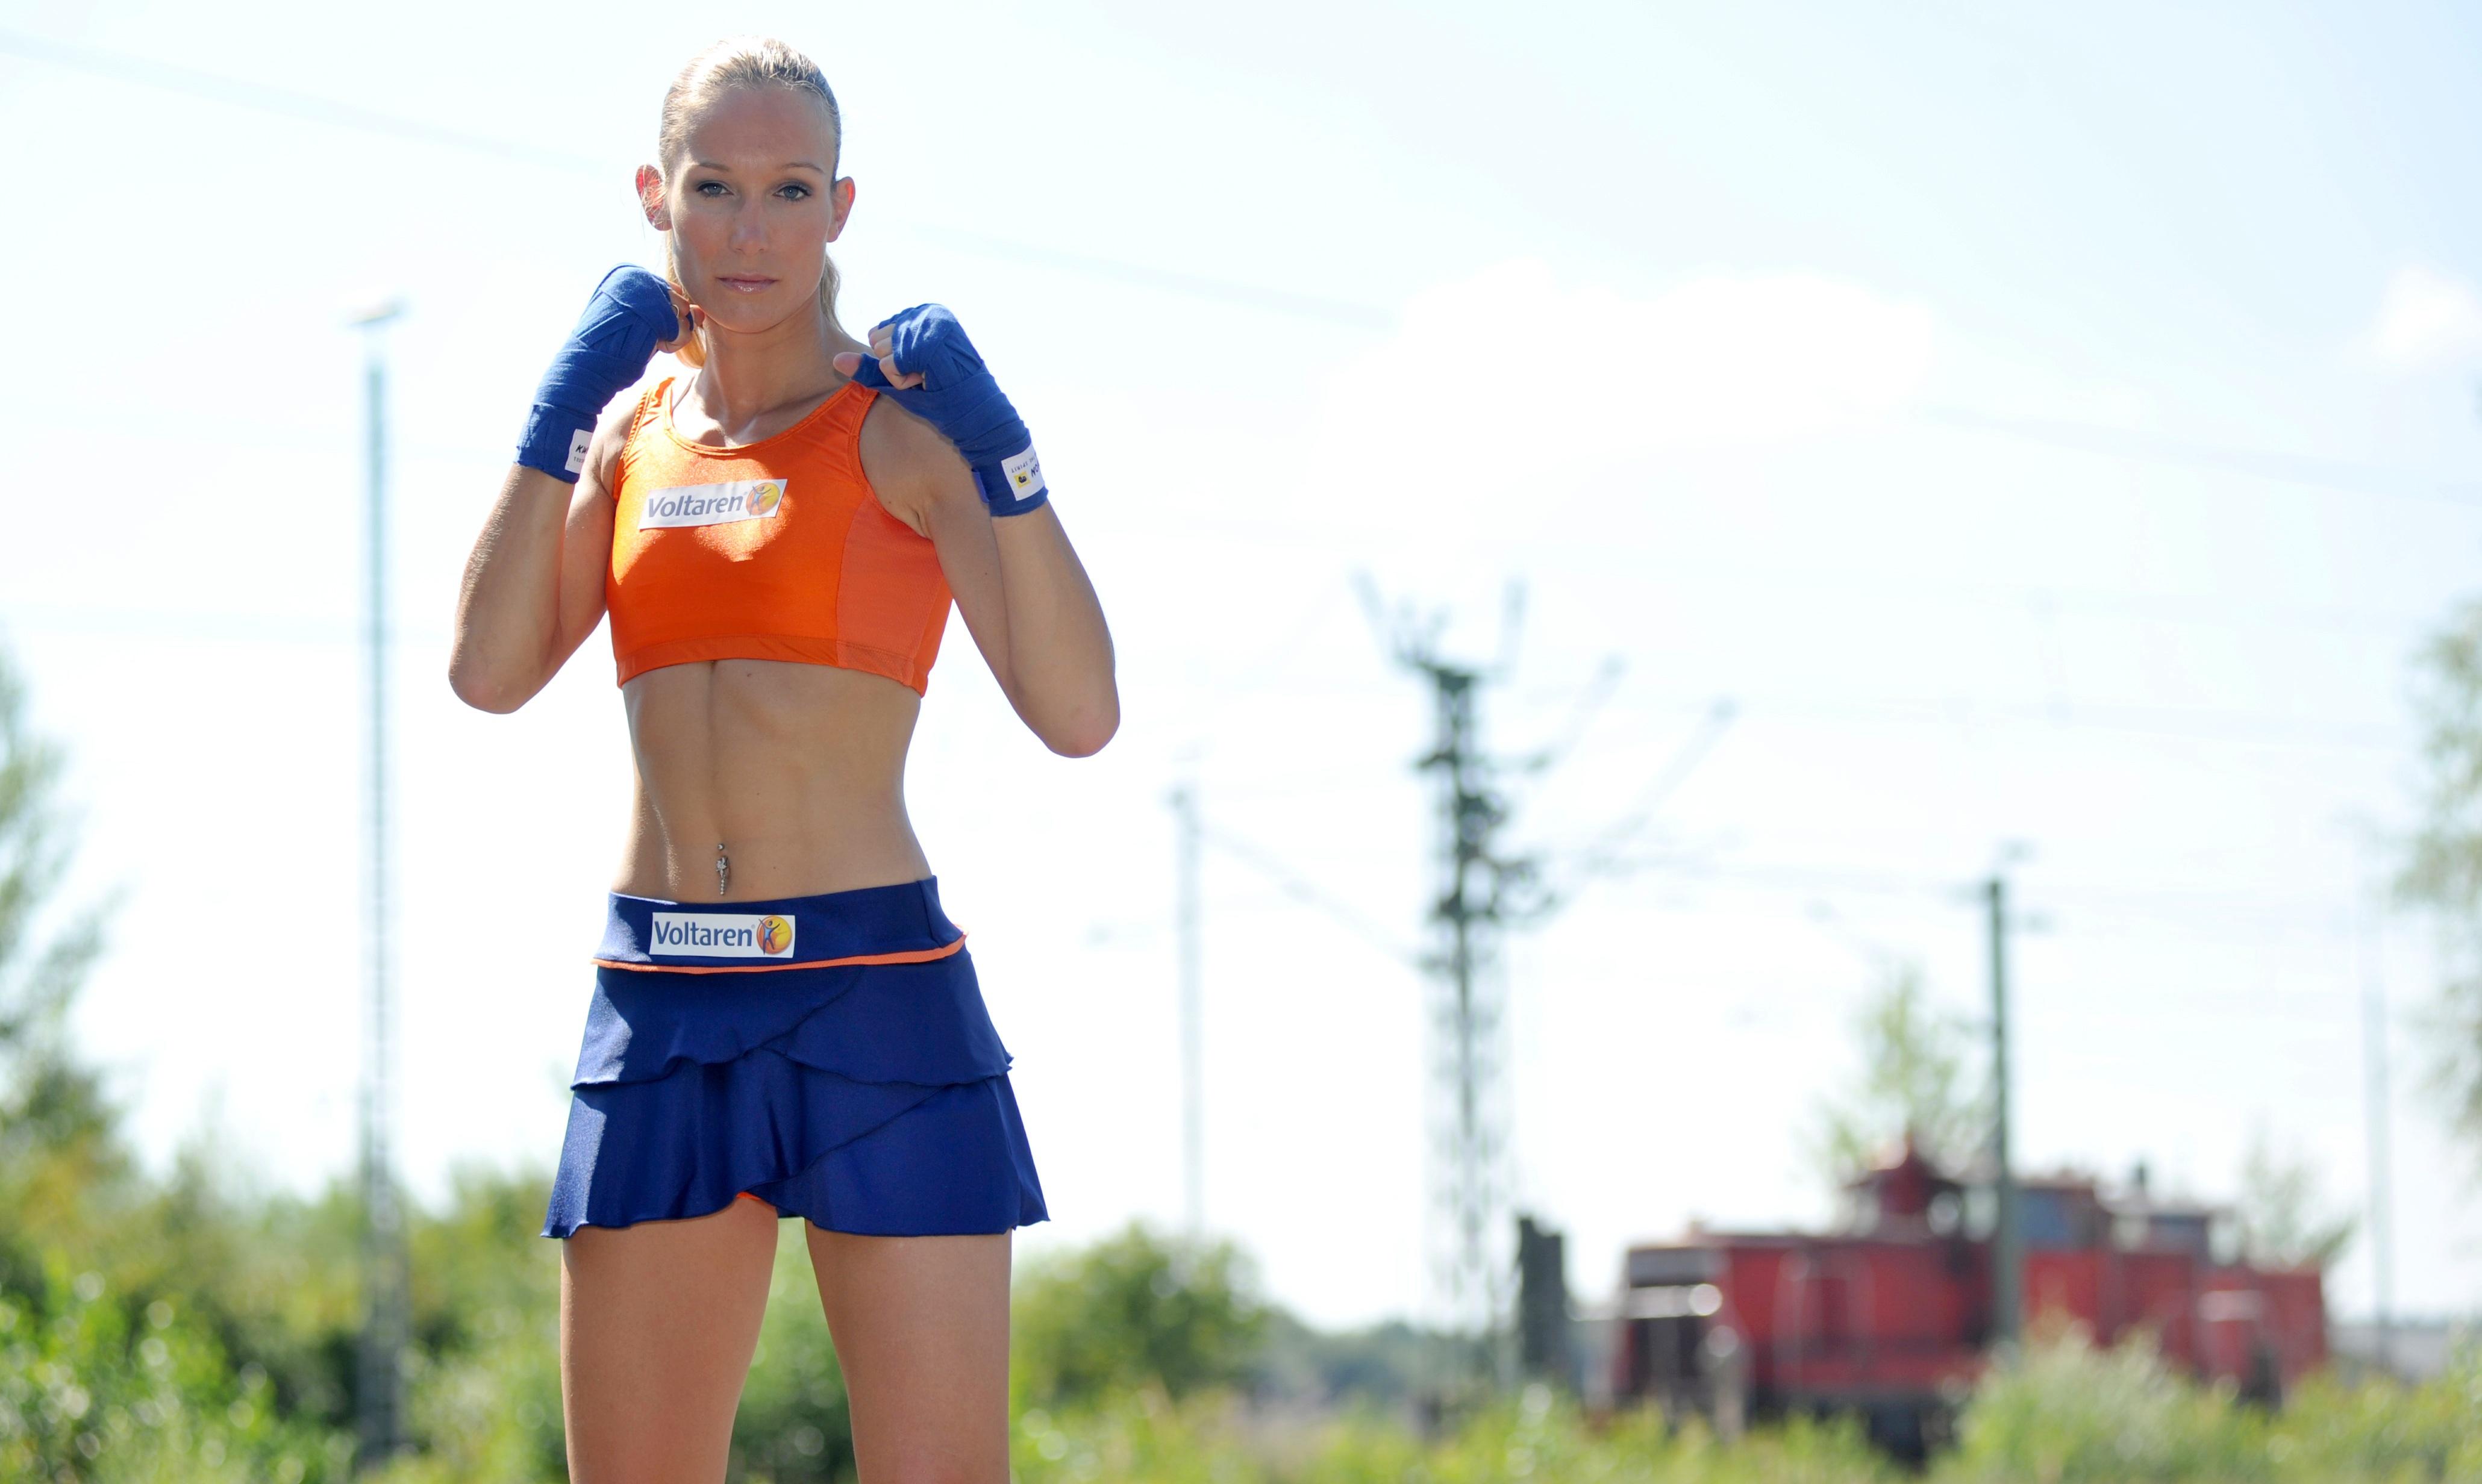 Christine Theiss Kickbox Photoshoot 2010 07